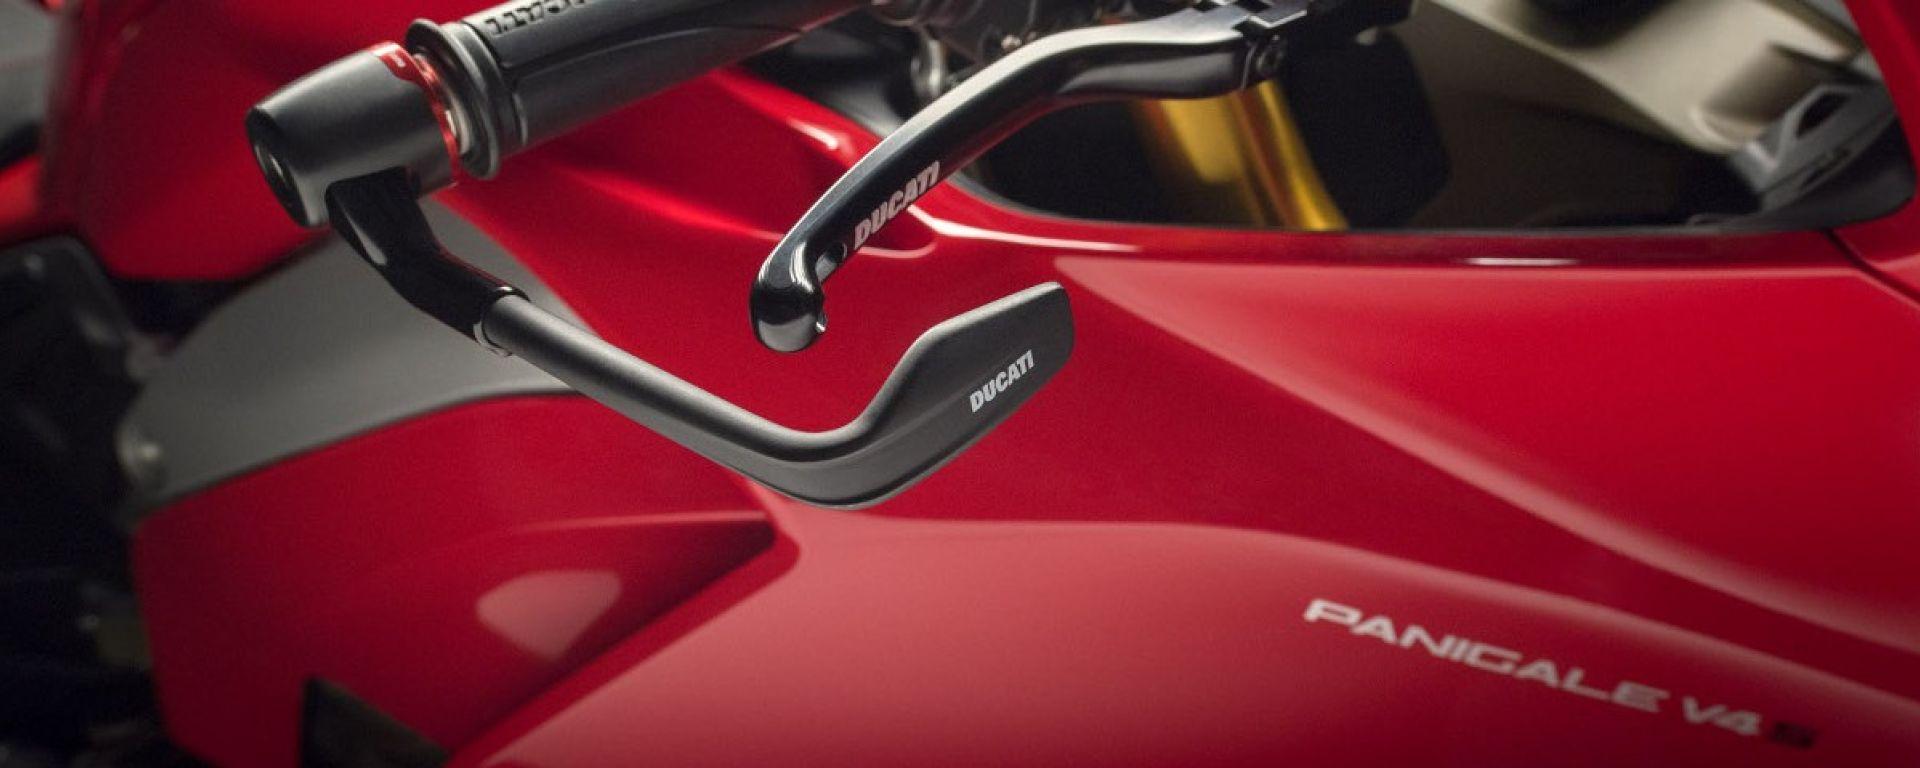 Ducati Panigale V4 by Rizoma